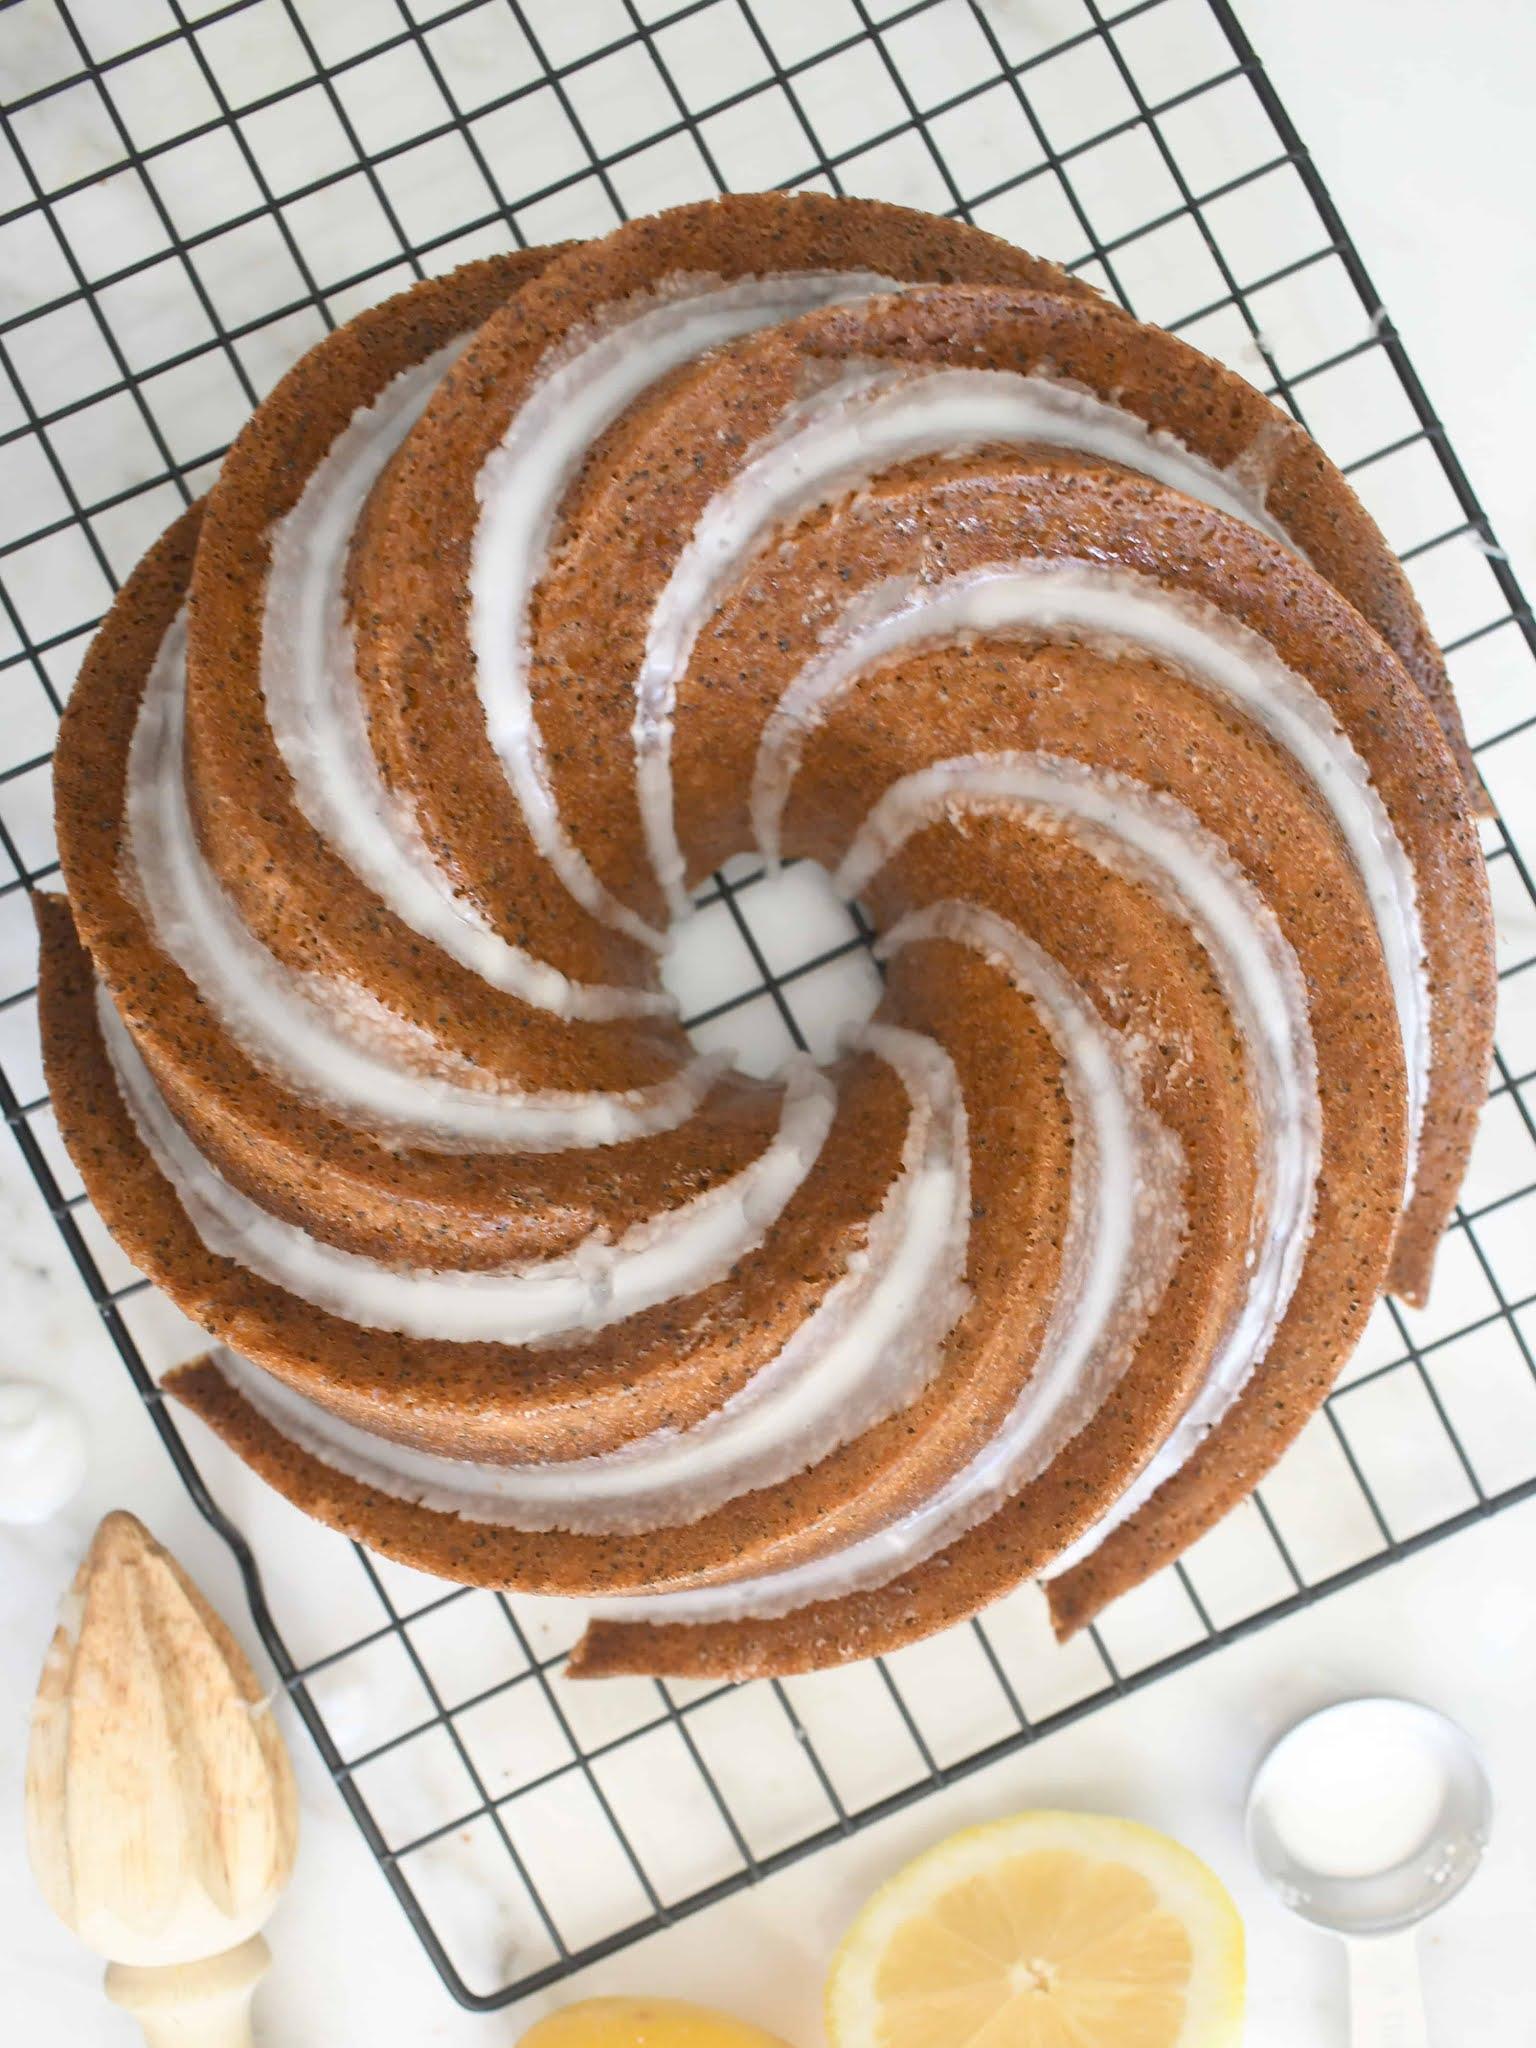 Step-by-step Homemade Lemon-Poppy Seed Bundt Cake